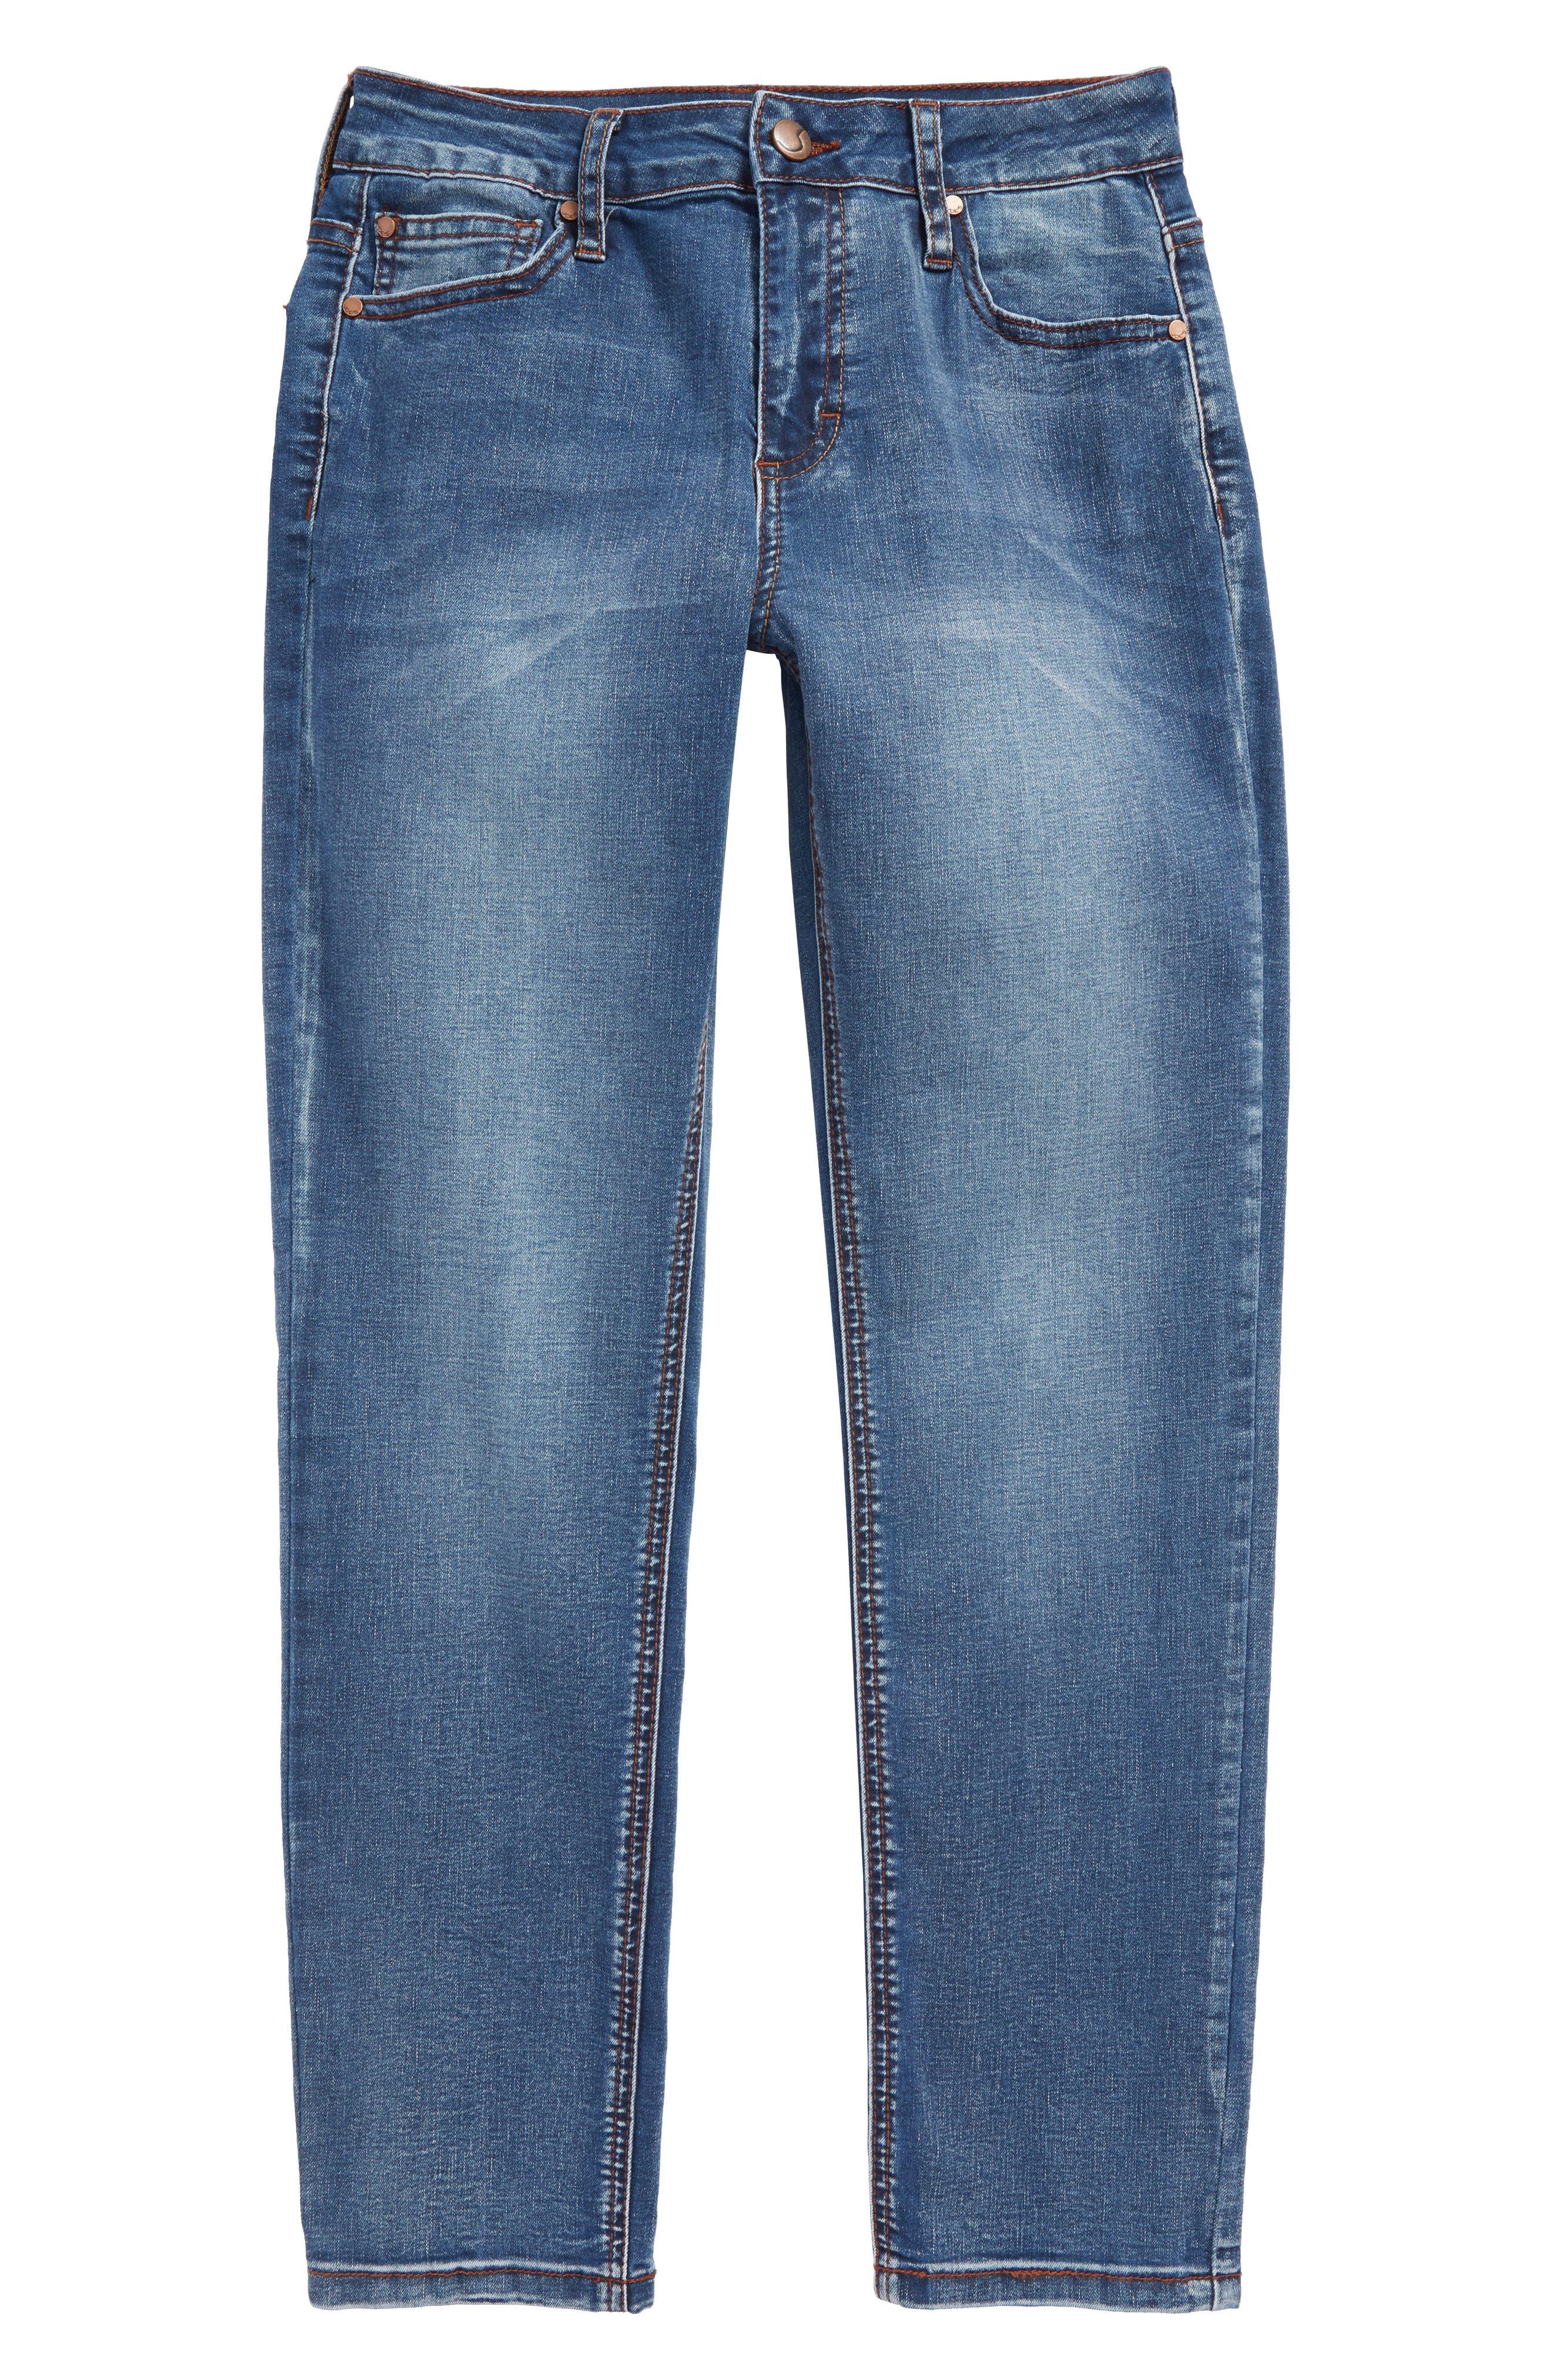 Brixton Slim Fit Stretch Jeans,                             Main thumbnail 1, color,                             Cielo